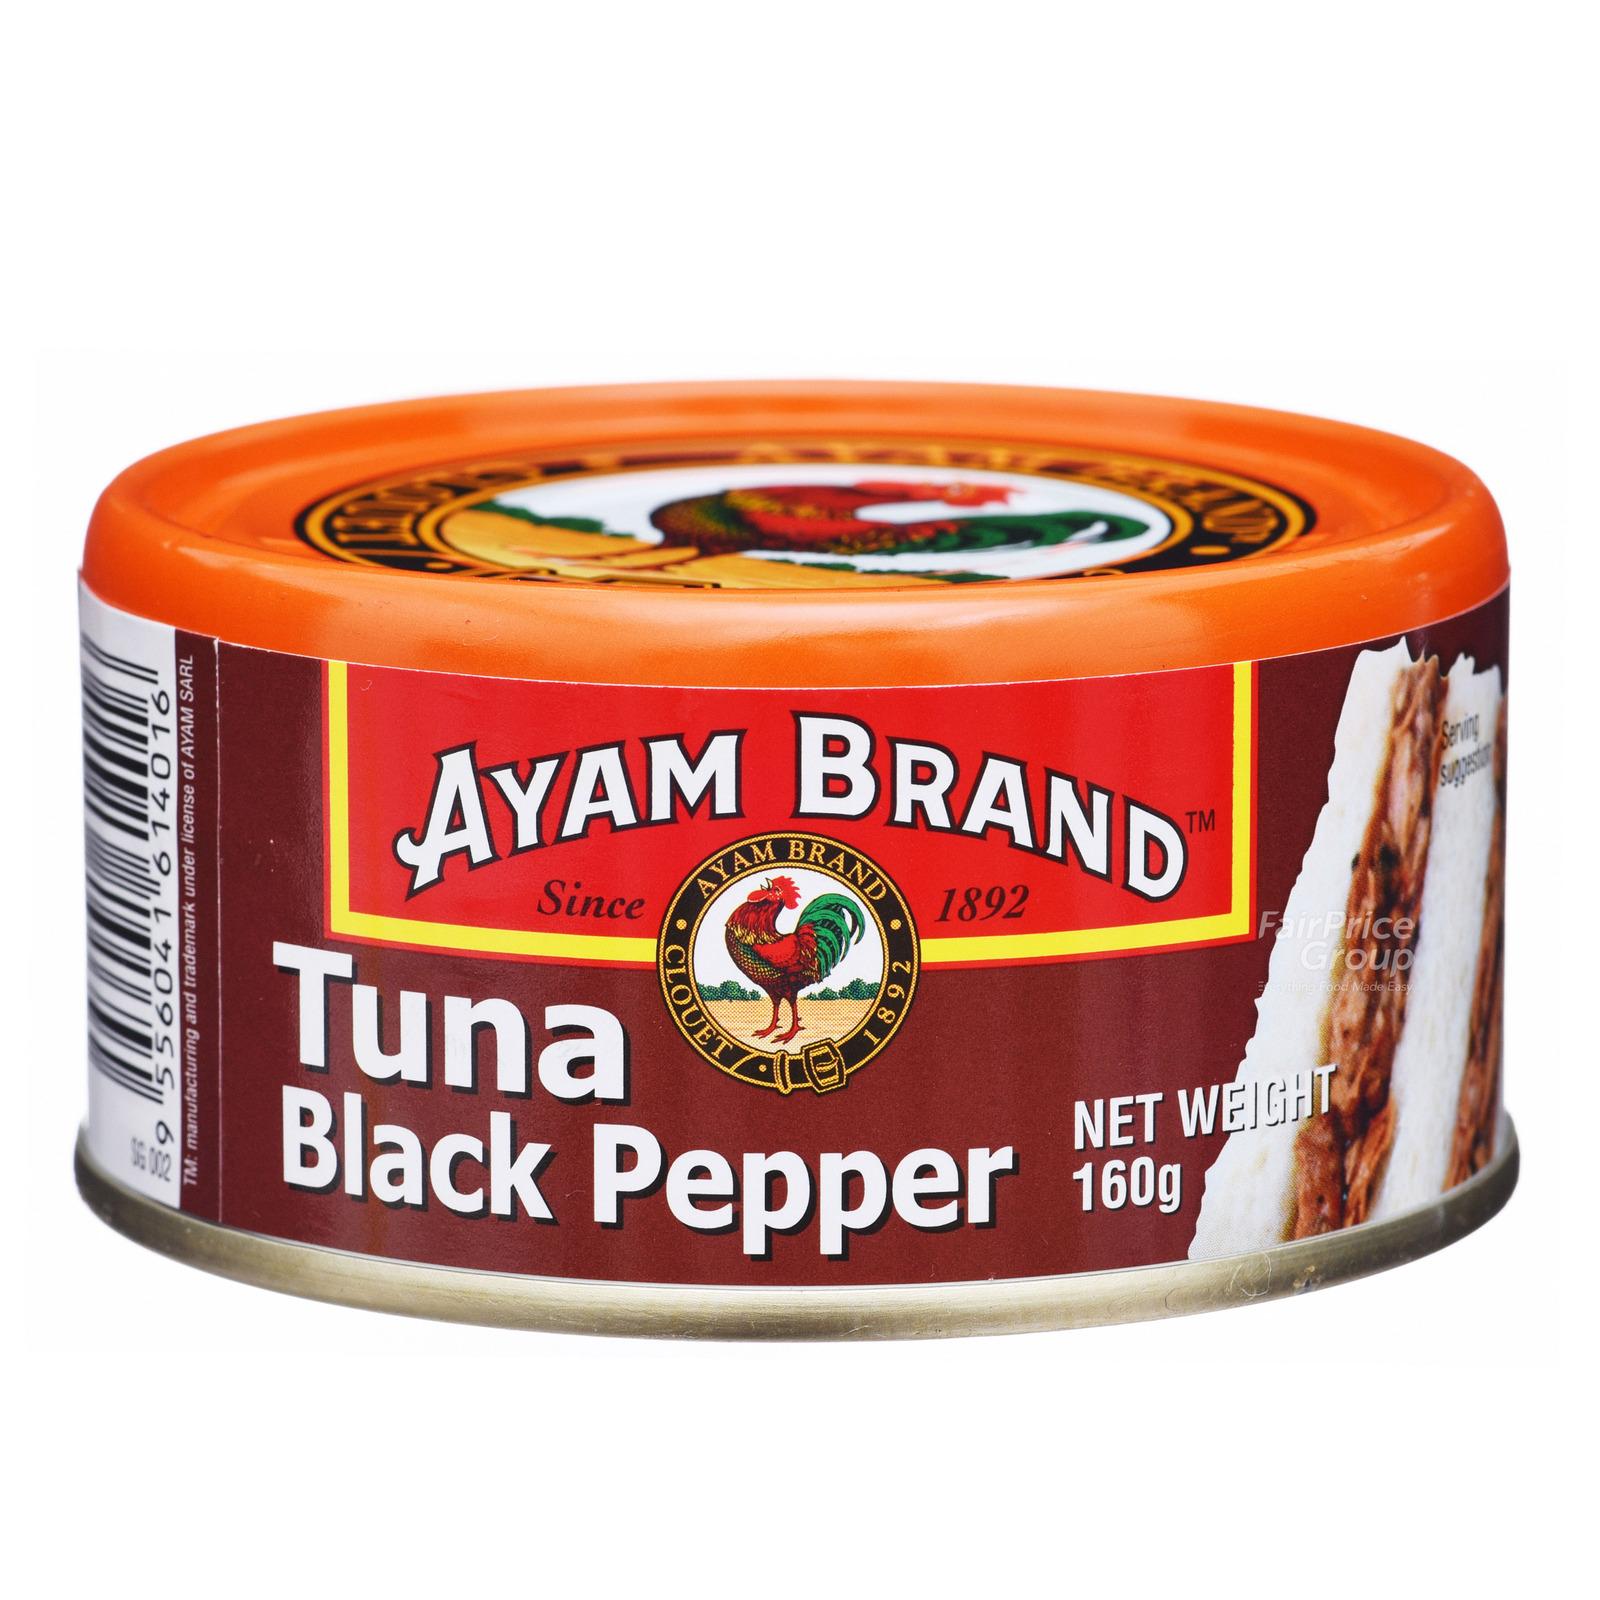 Ayam Brand Tuna - Black Pepper